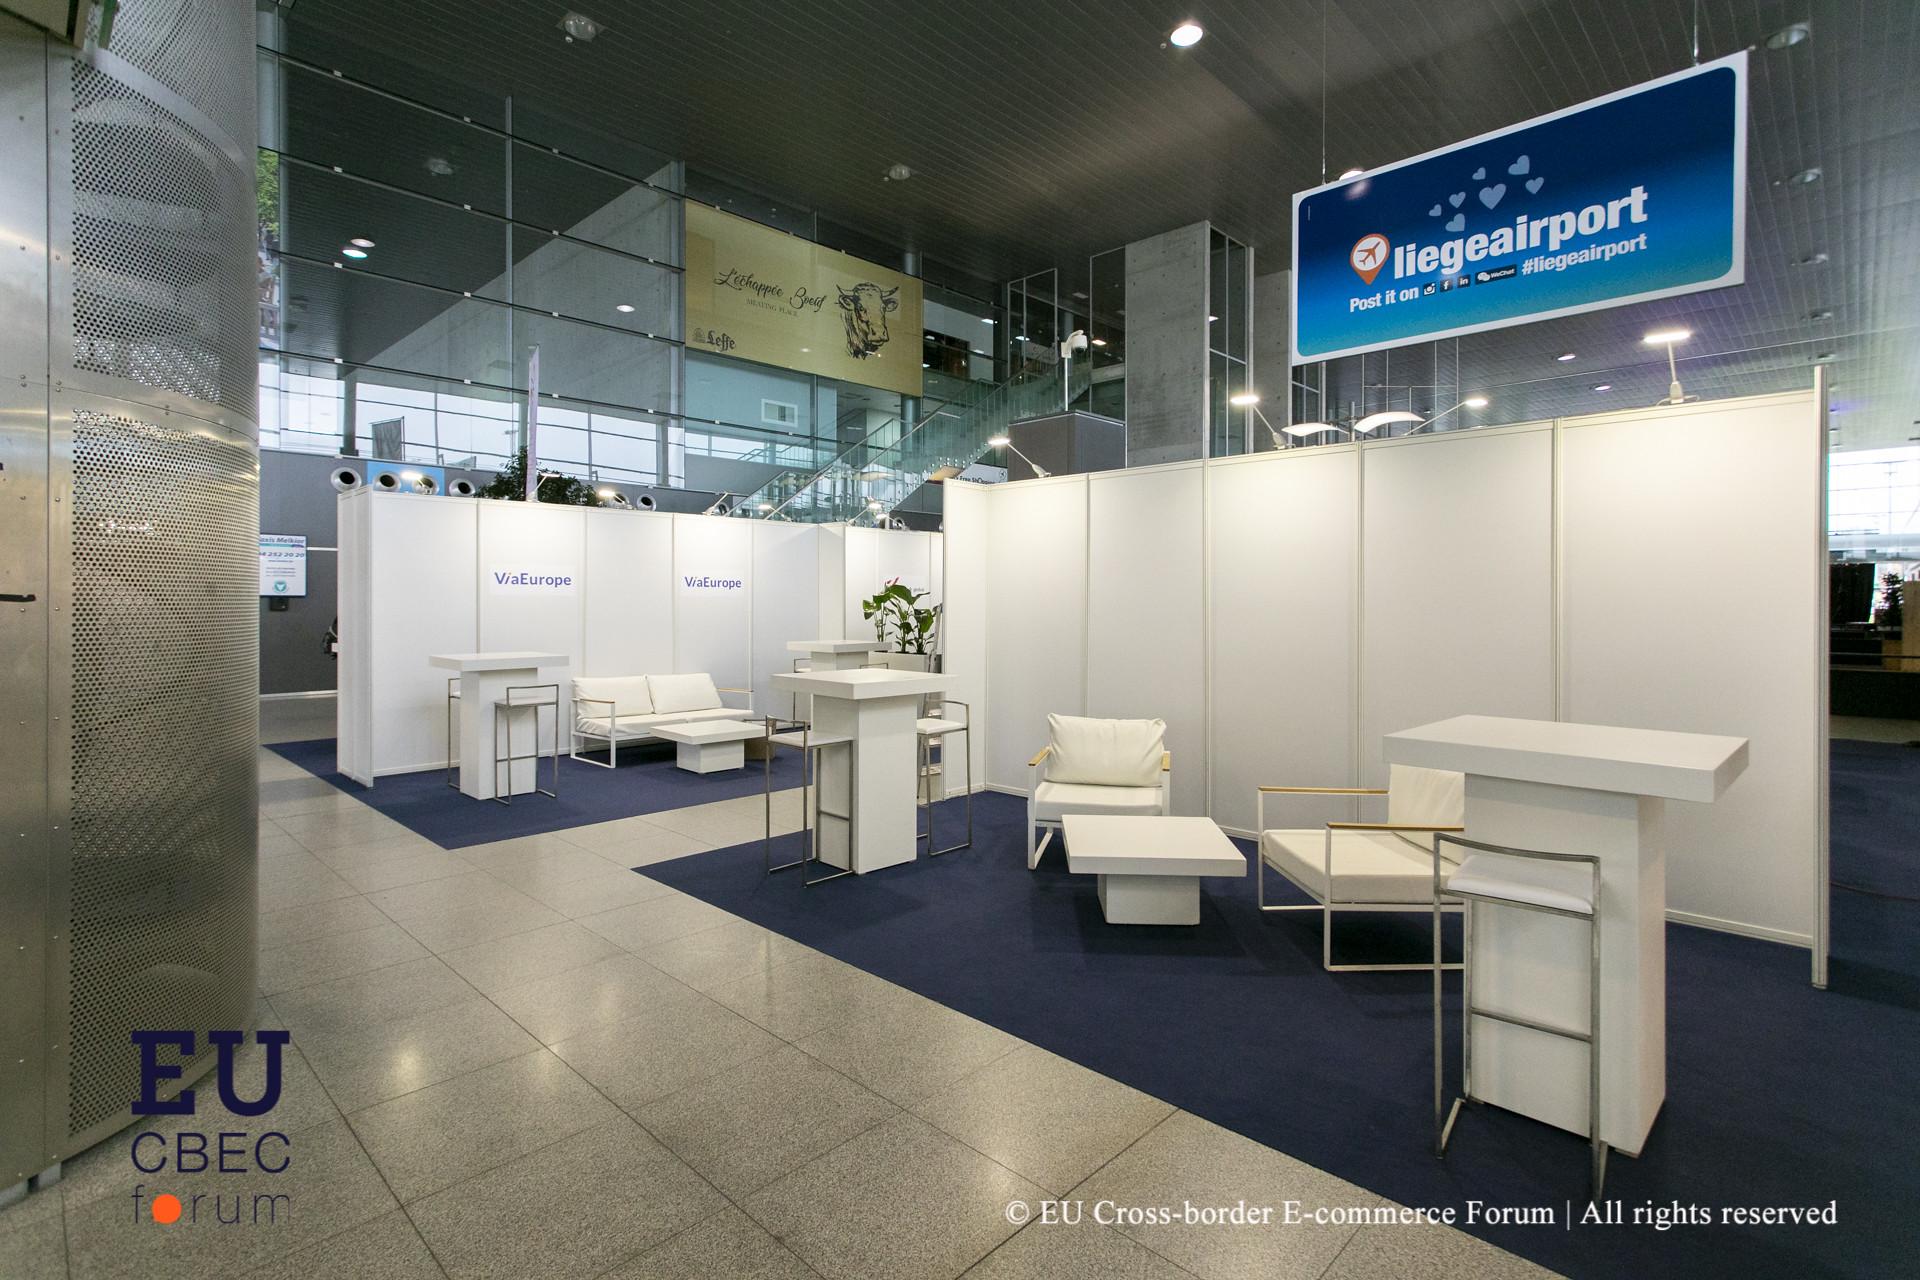 EU Cross-border E-commerce Forum